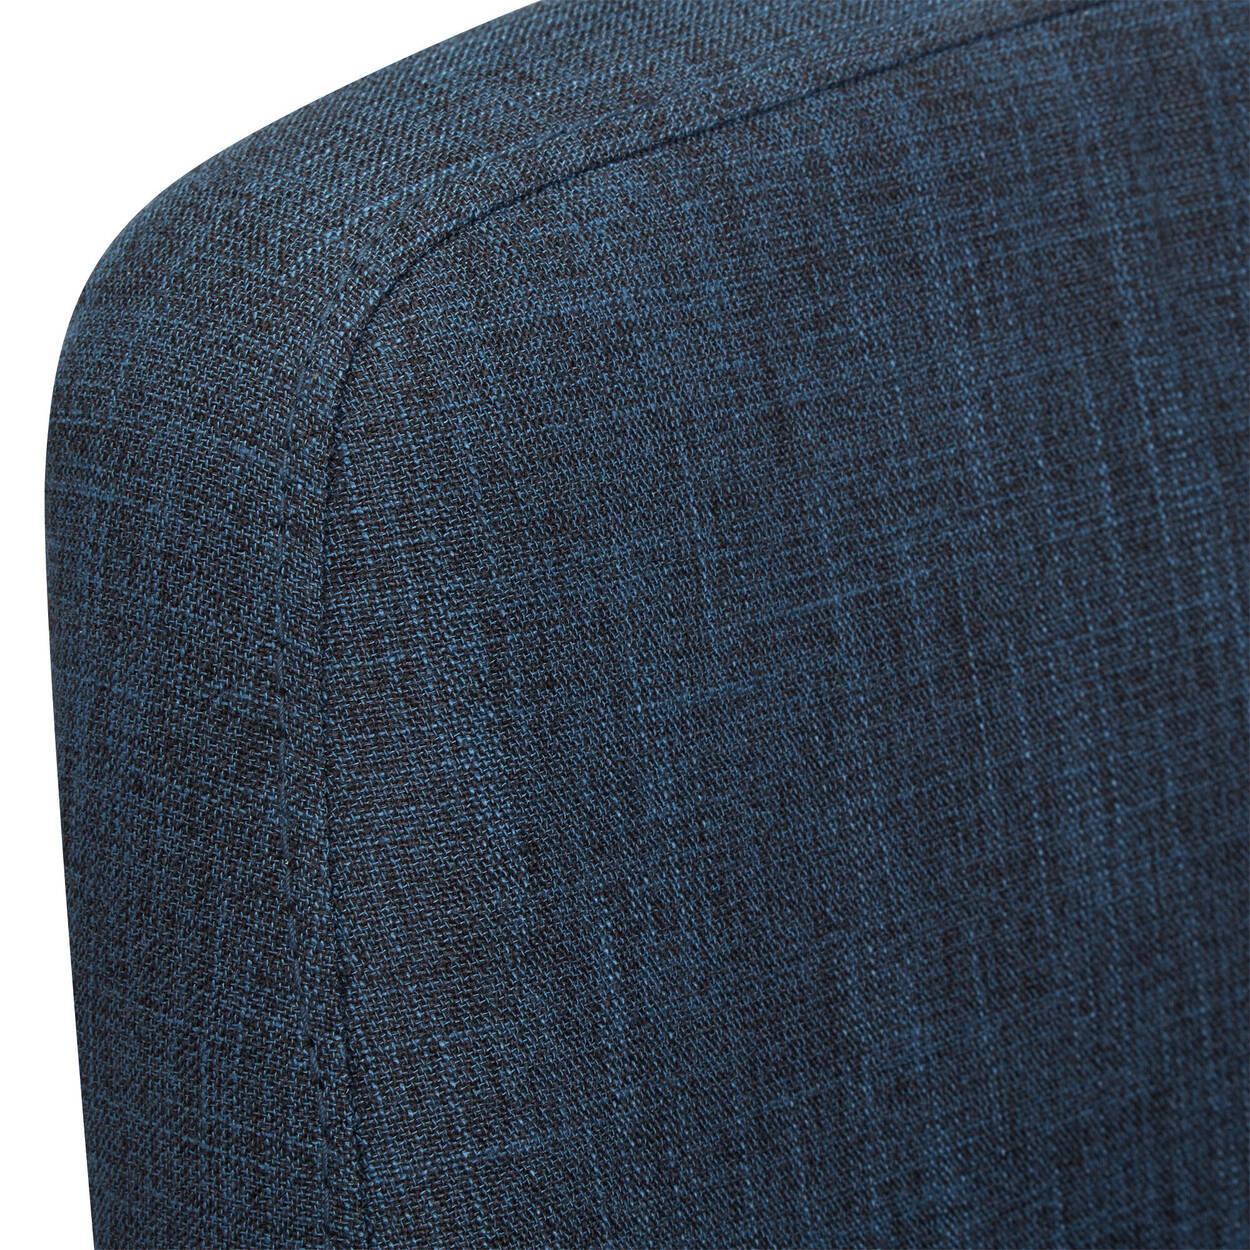 Chita Fabric and Metal Adjustable Stool